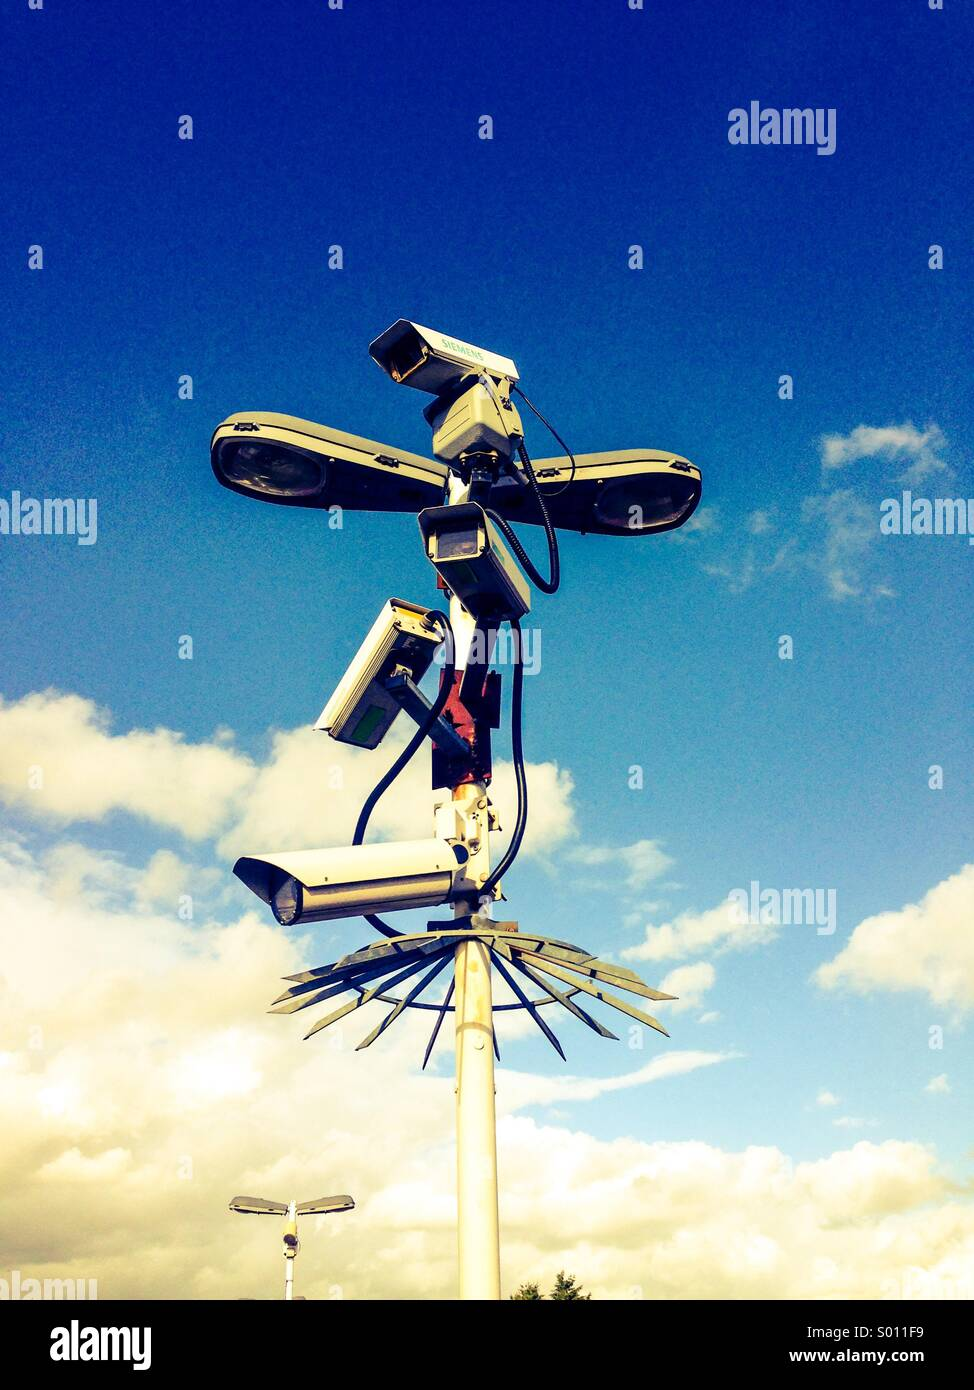 Surveillance cameras - Stock Image